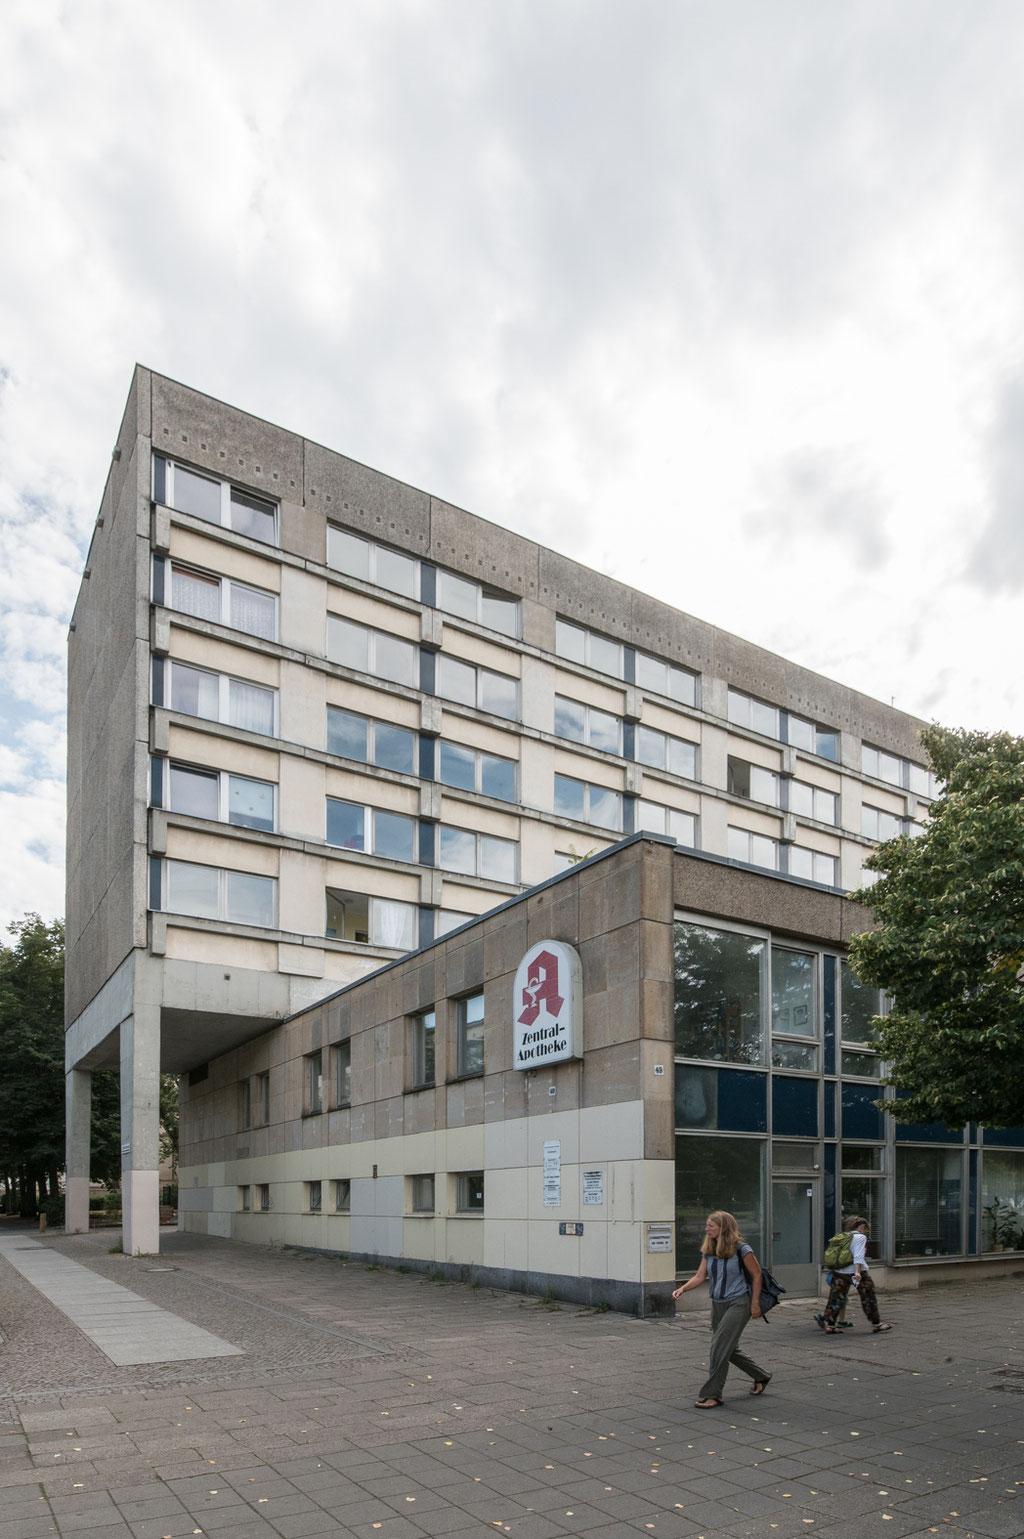 Wohnhaus am Staudenhof (Hartwig Ebert, Peter Mylo, Fritz Neuendorf), Potsdam (D)